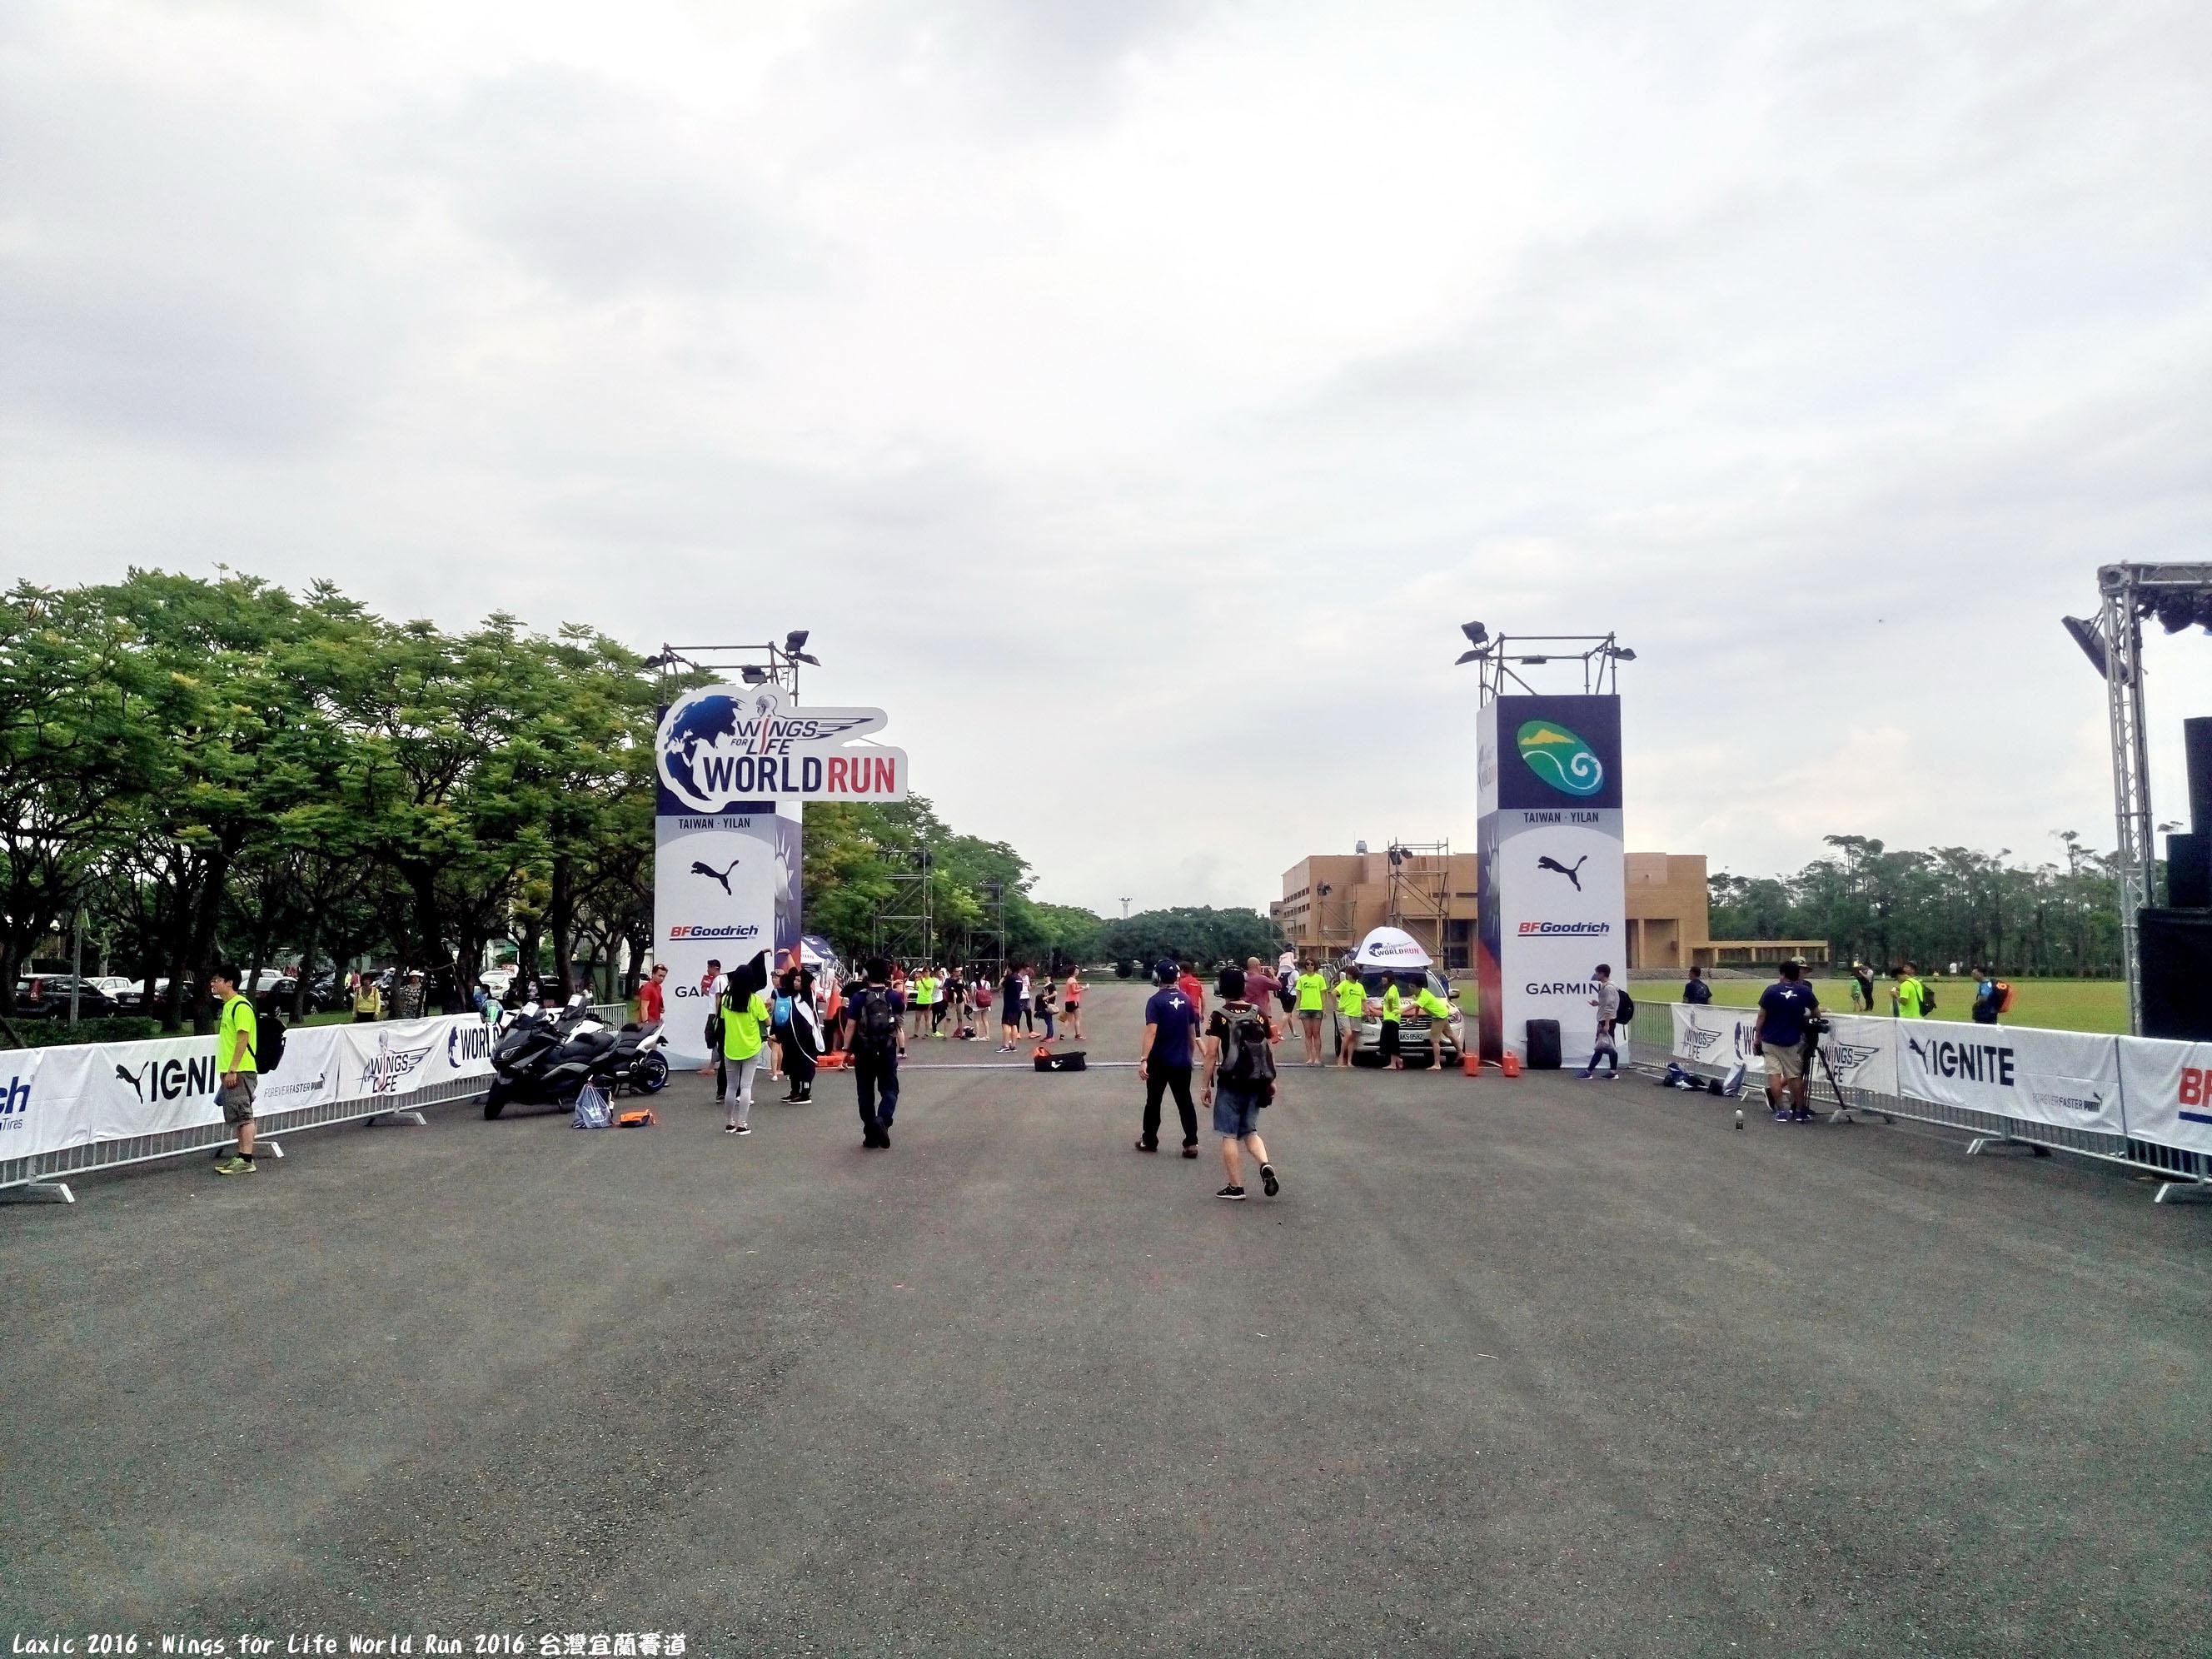 2016.05 Wings for Life World Run 2016 台灣宜蘭賽道